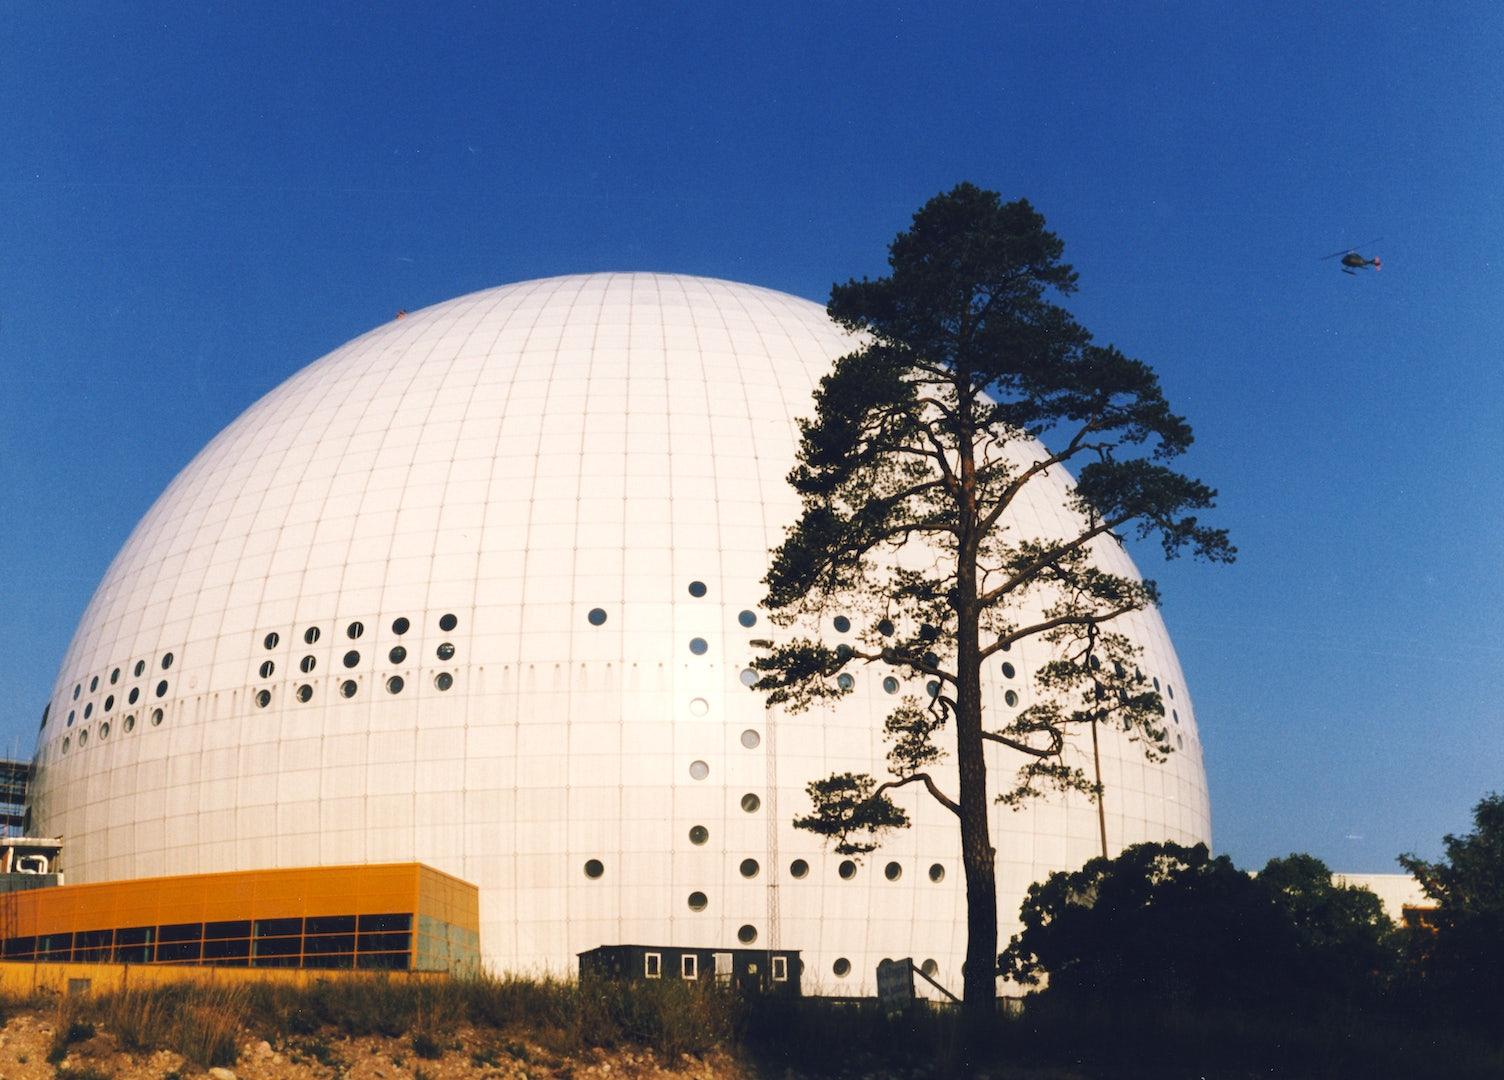 Ericsson Globe building